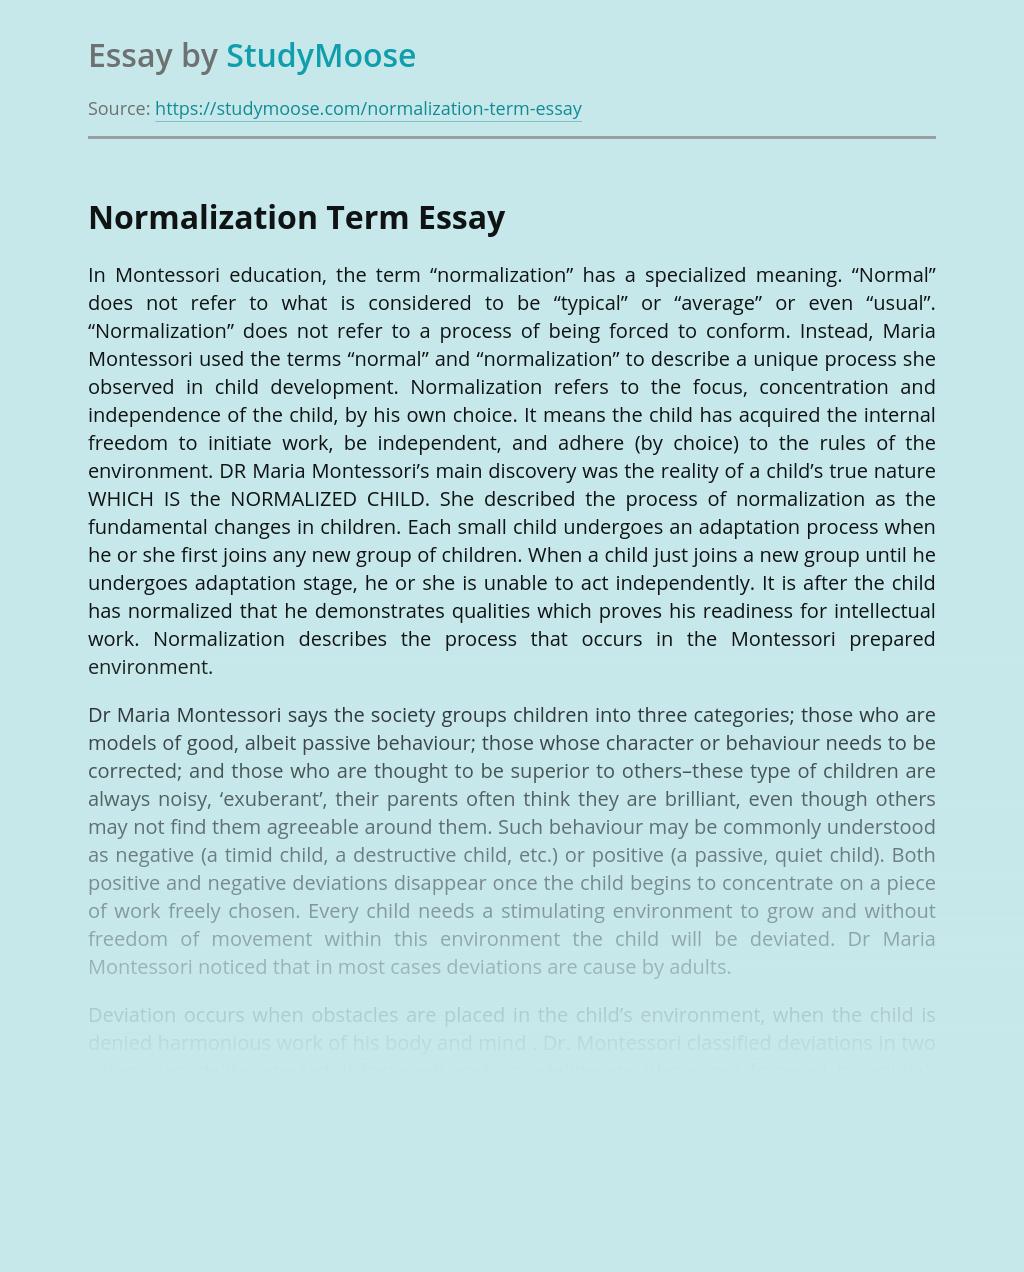 Normalization Term